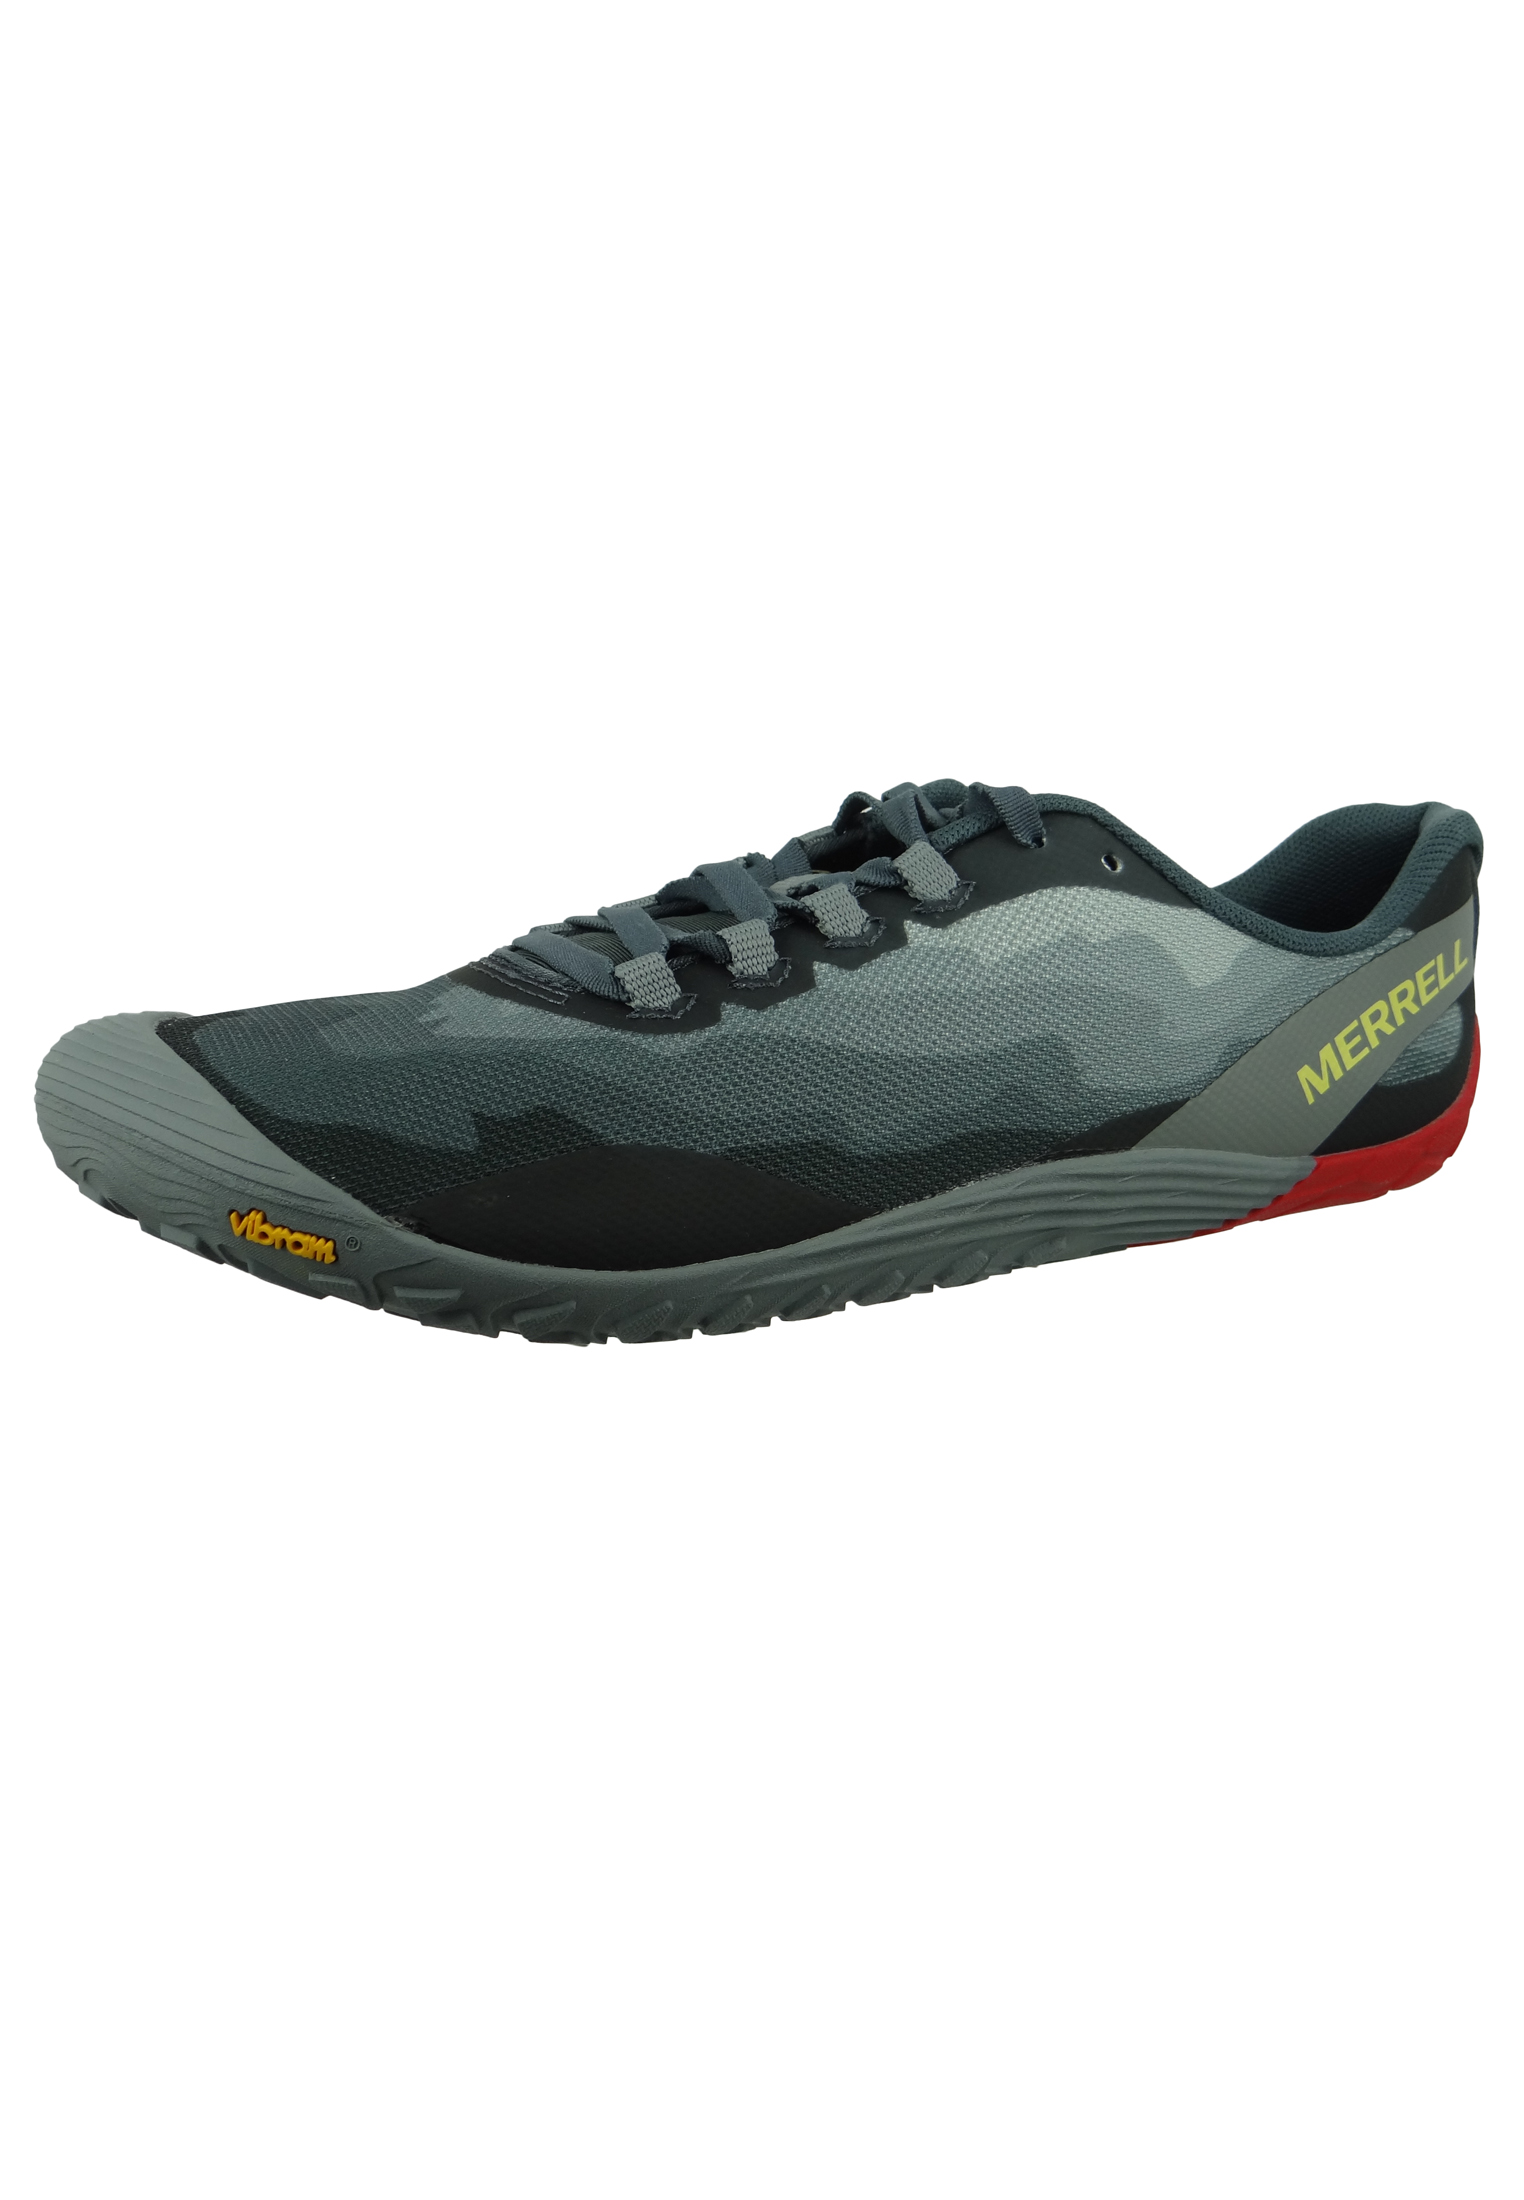 4 Trail Running Run Barefoot Herren Monument Vapor Glove Merrell J50403 Grau 0ONn8PwkX